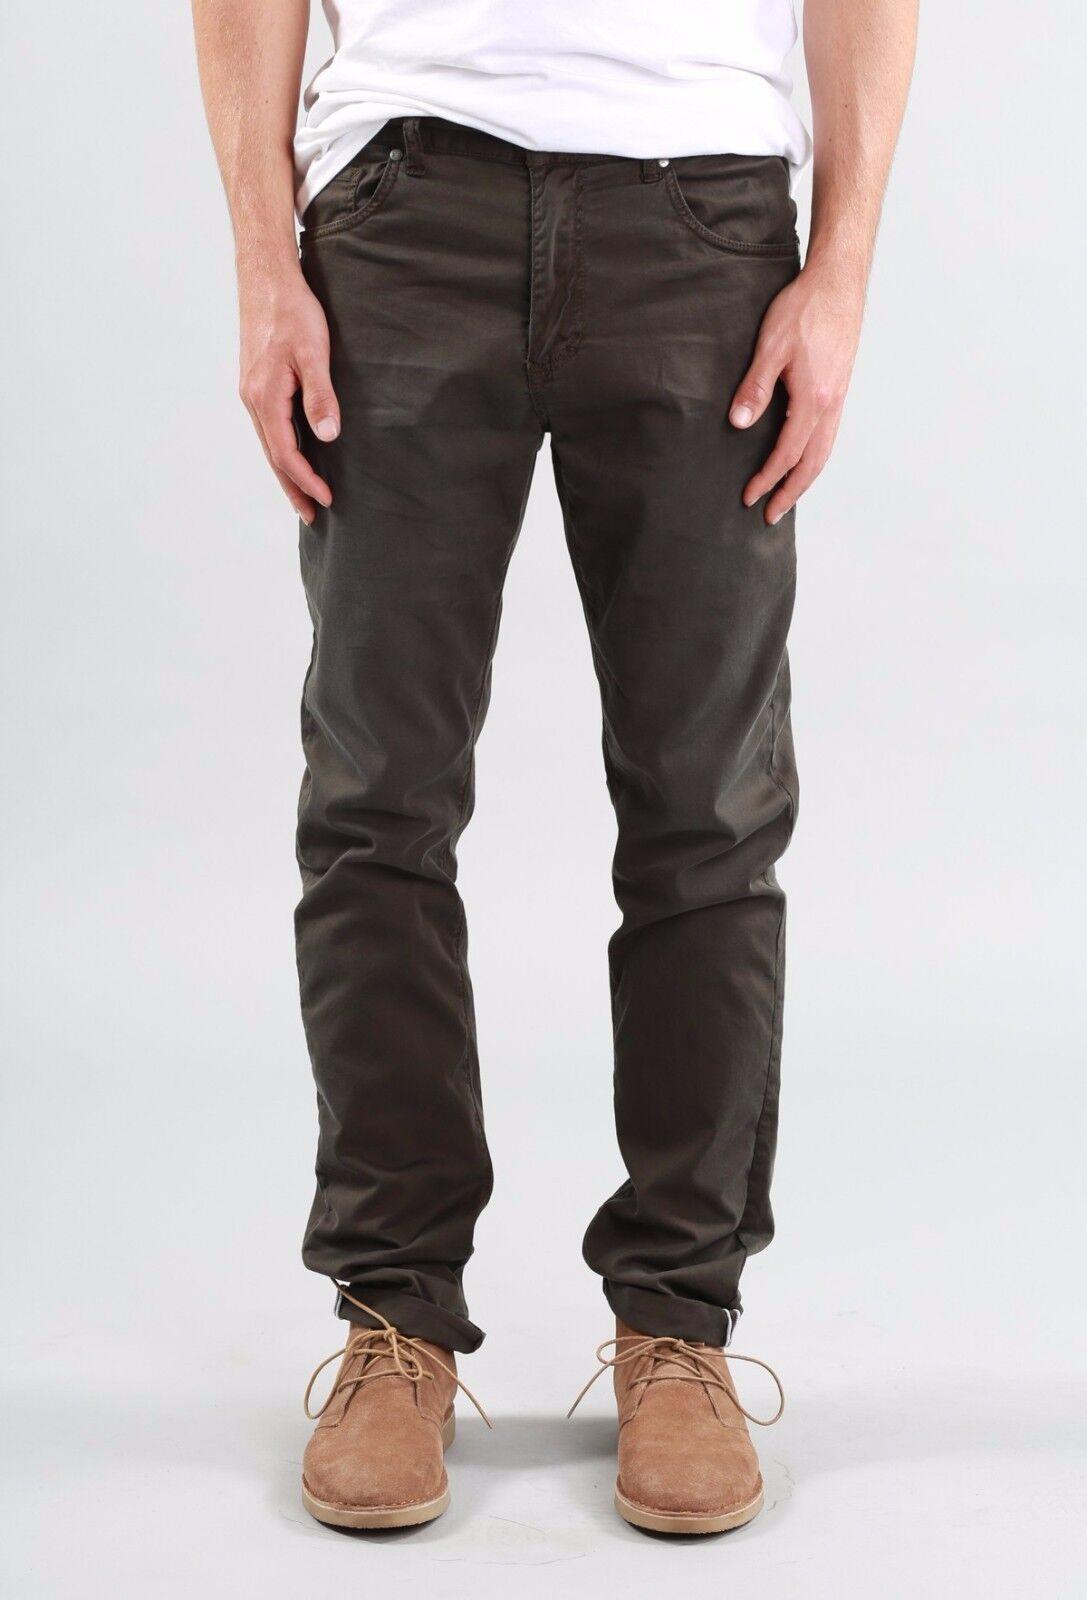 Rusty Indi Slims Men Slouch Rise Narrow leg Illusion Pants Gravel Size W36